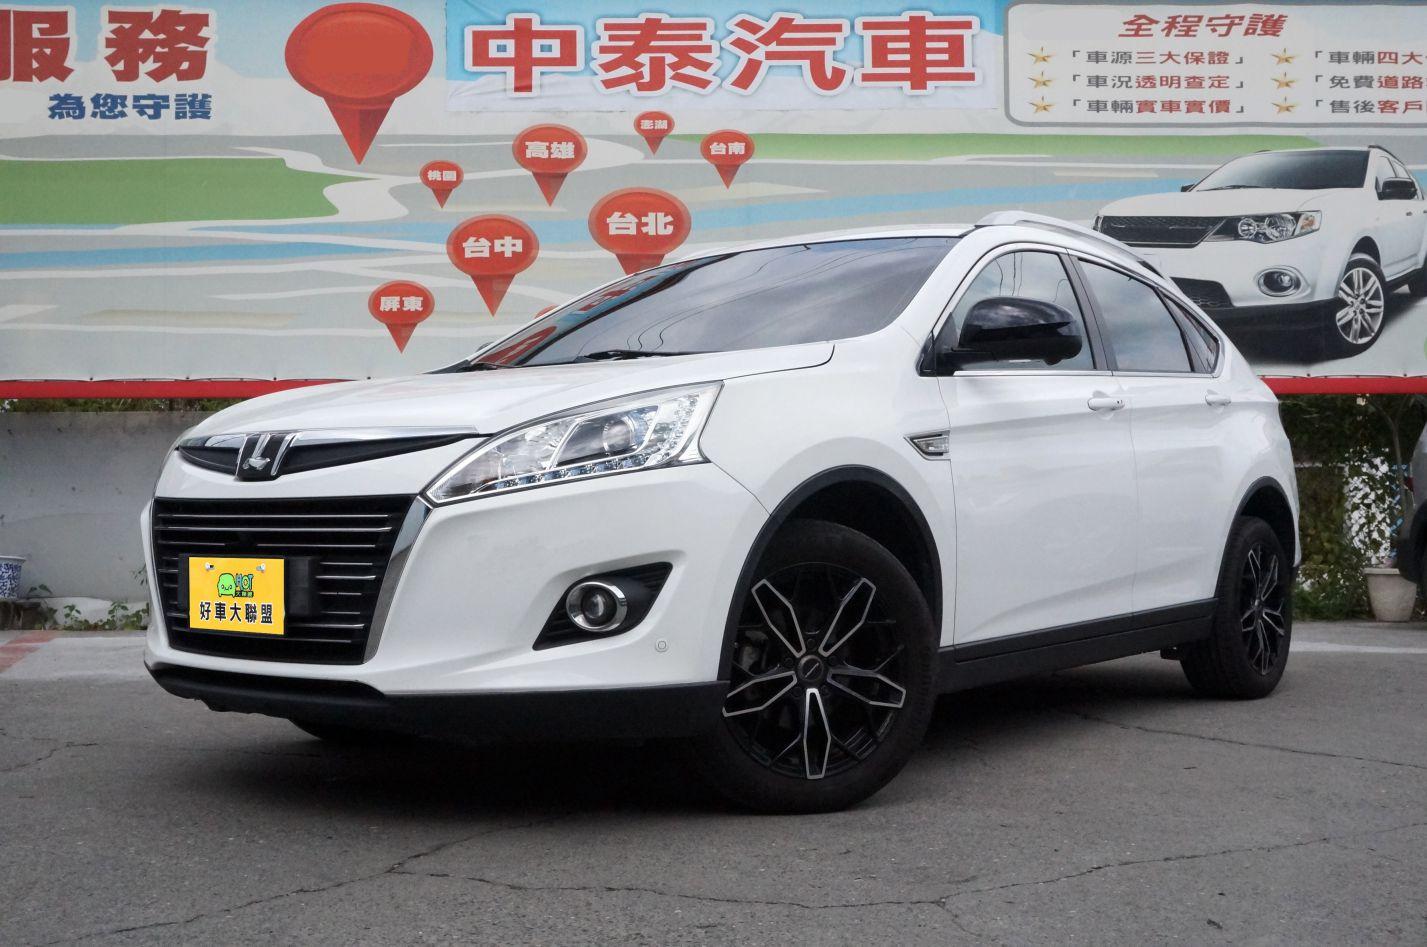 2015 Luxgen 納智捷 U6 turbo